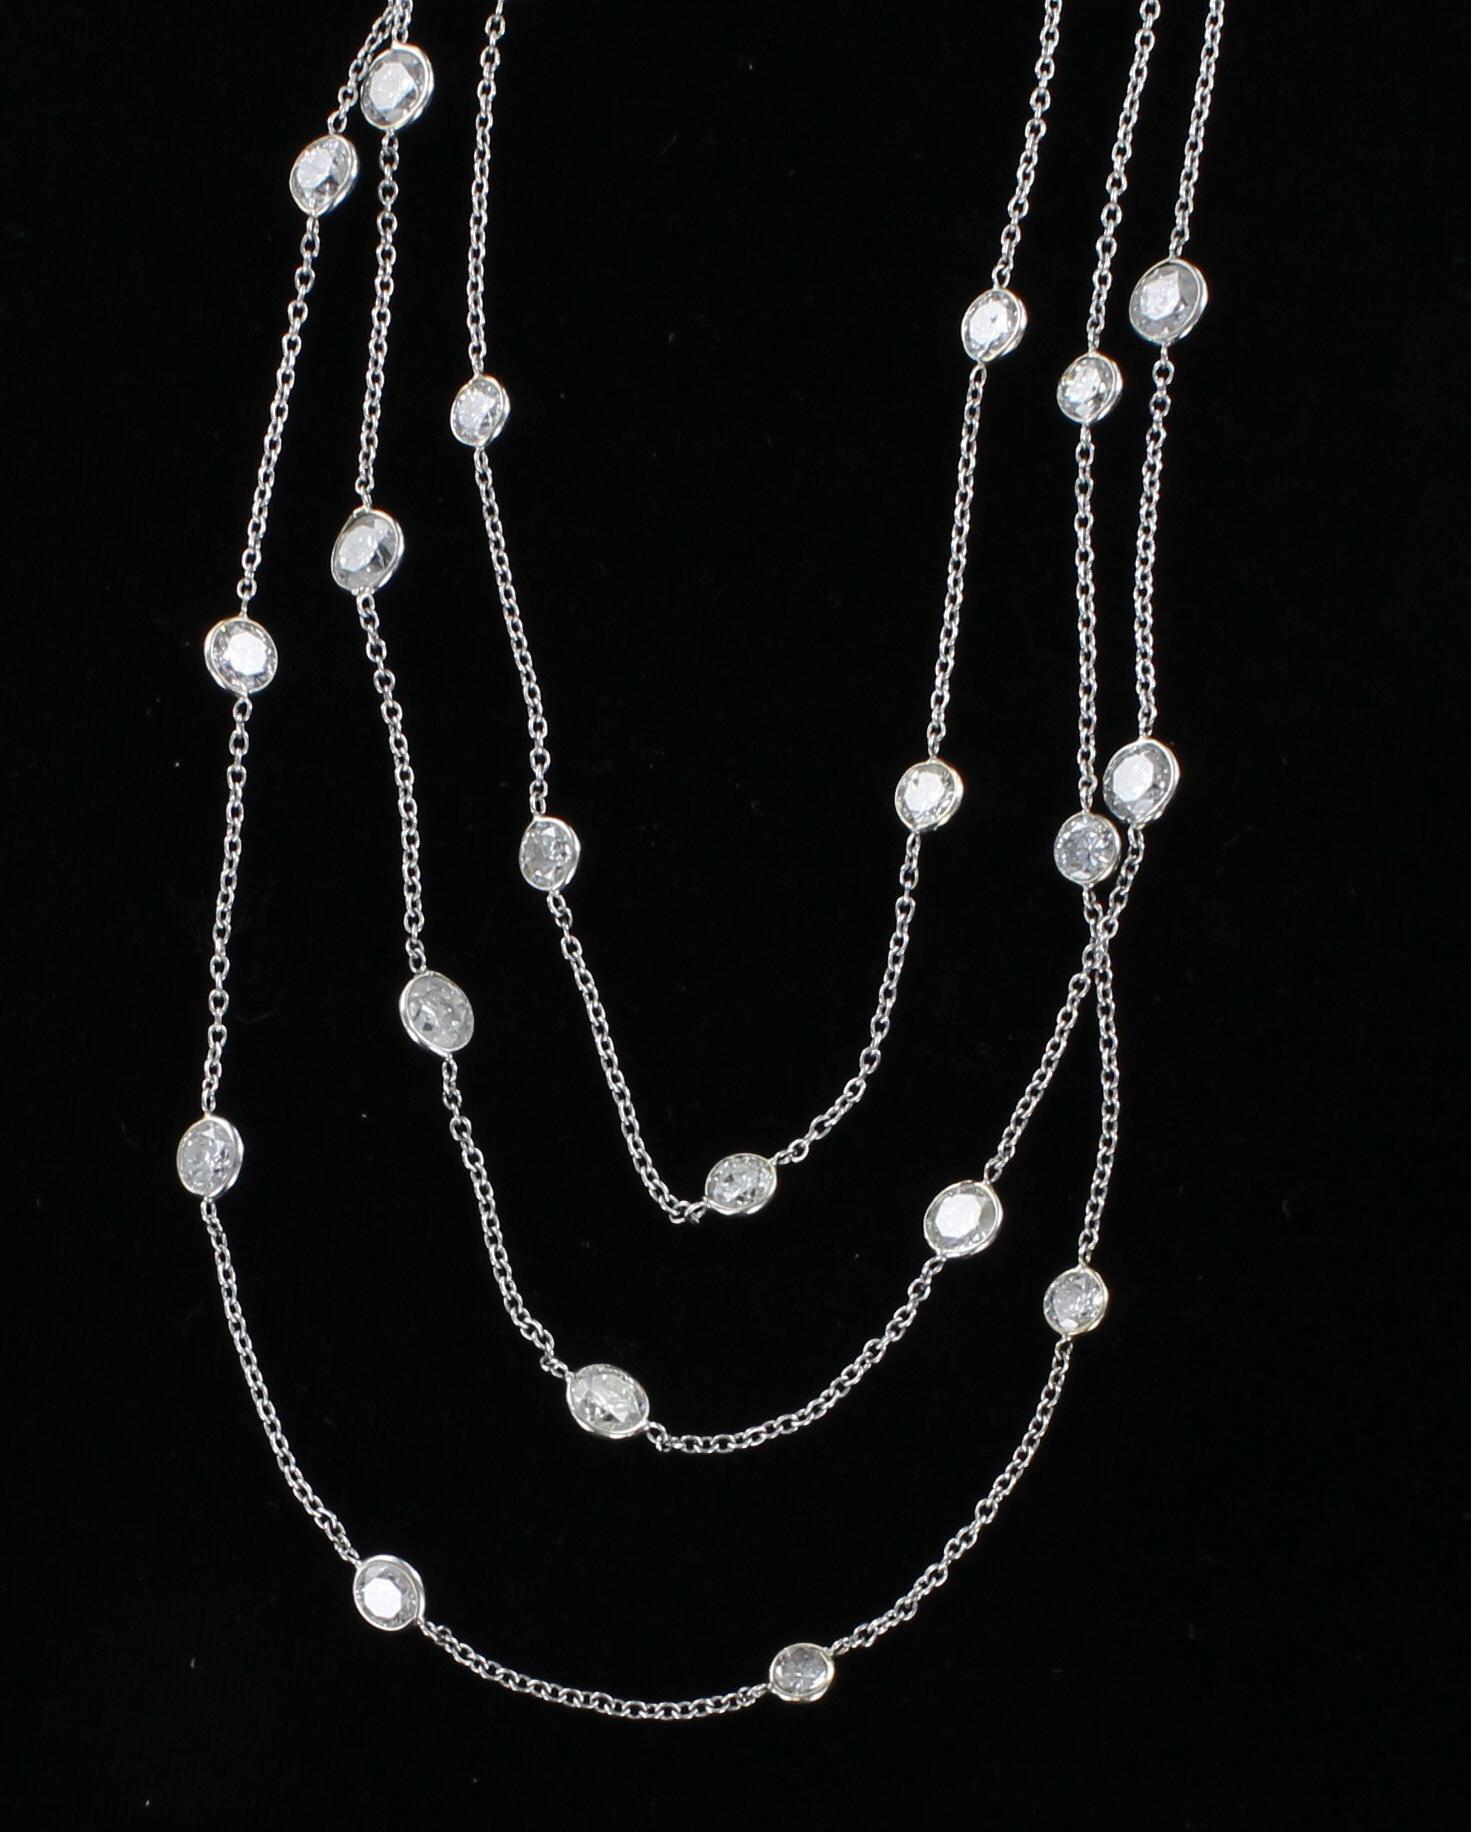 14KTW 22.5 CT TW DIAMOND CHAIN NECKLACE 205-2593